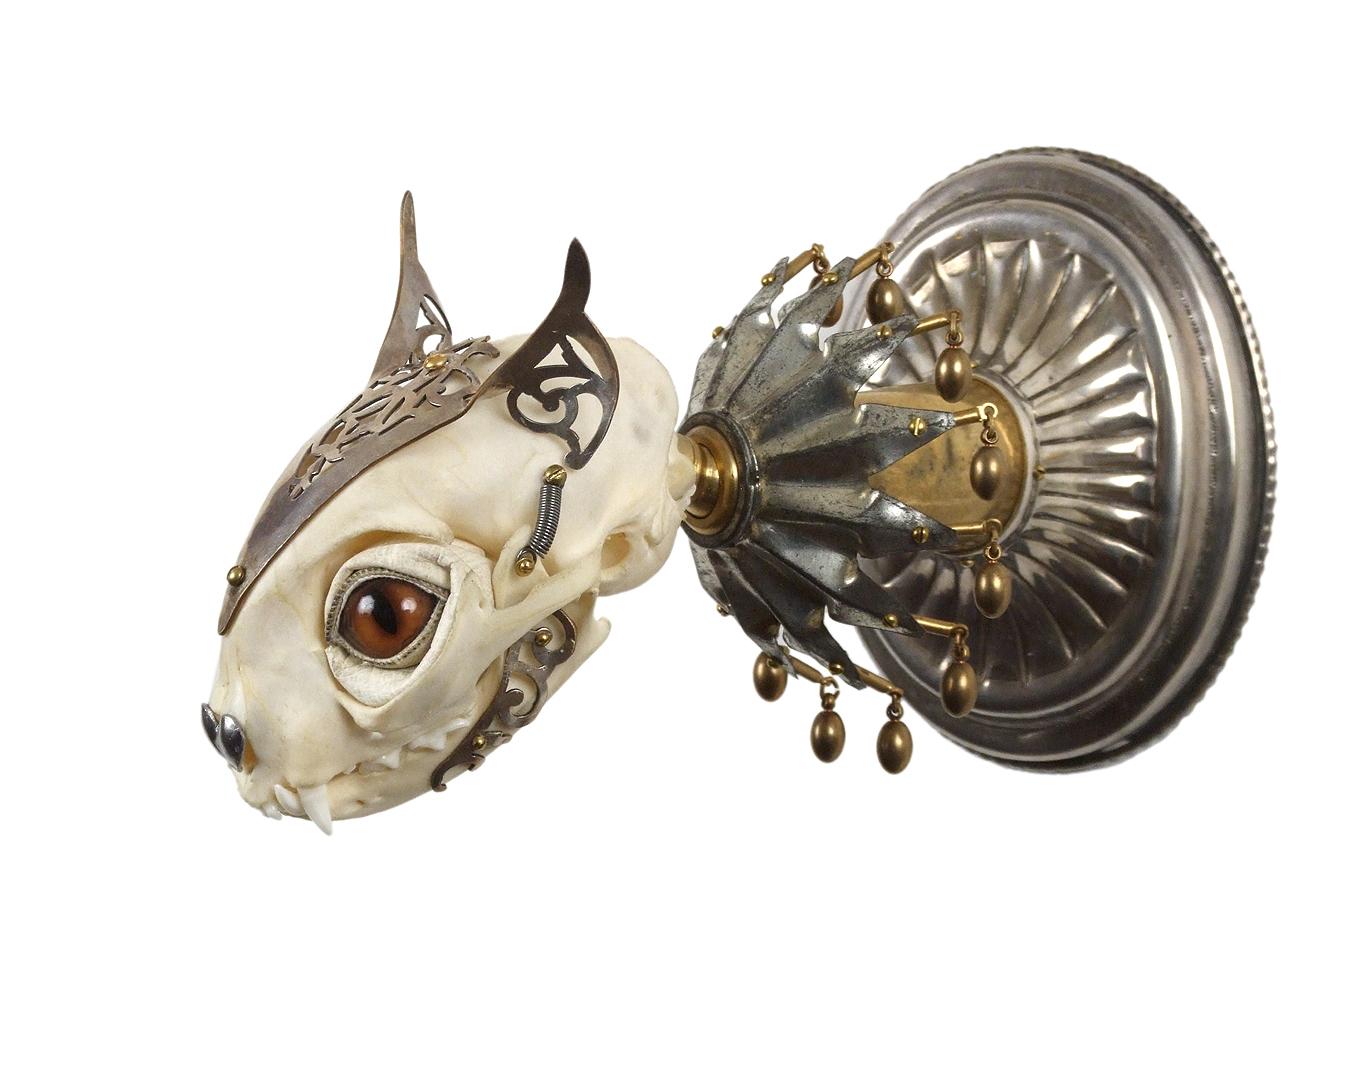 Jessica Joslin – Cat – Antique brass hardware and findings, silver filigree cut-work, bone, steel, beads, glove leather, glass eyes